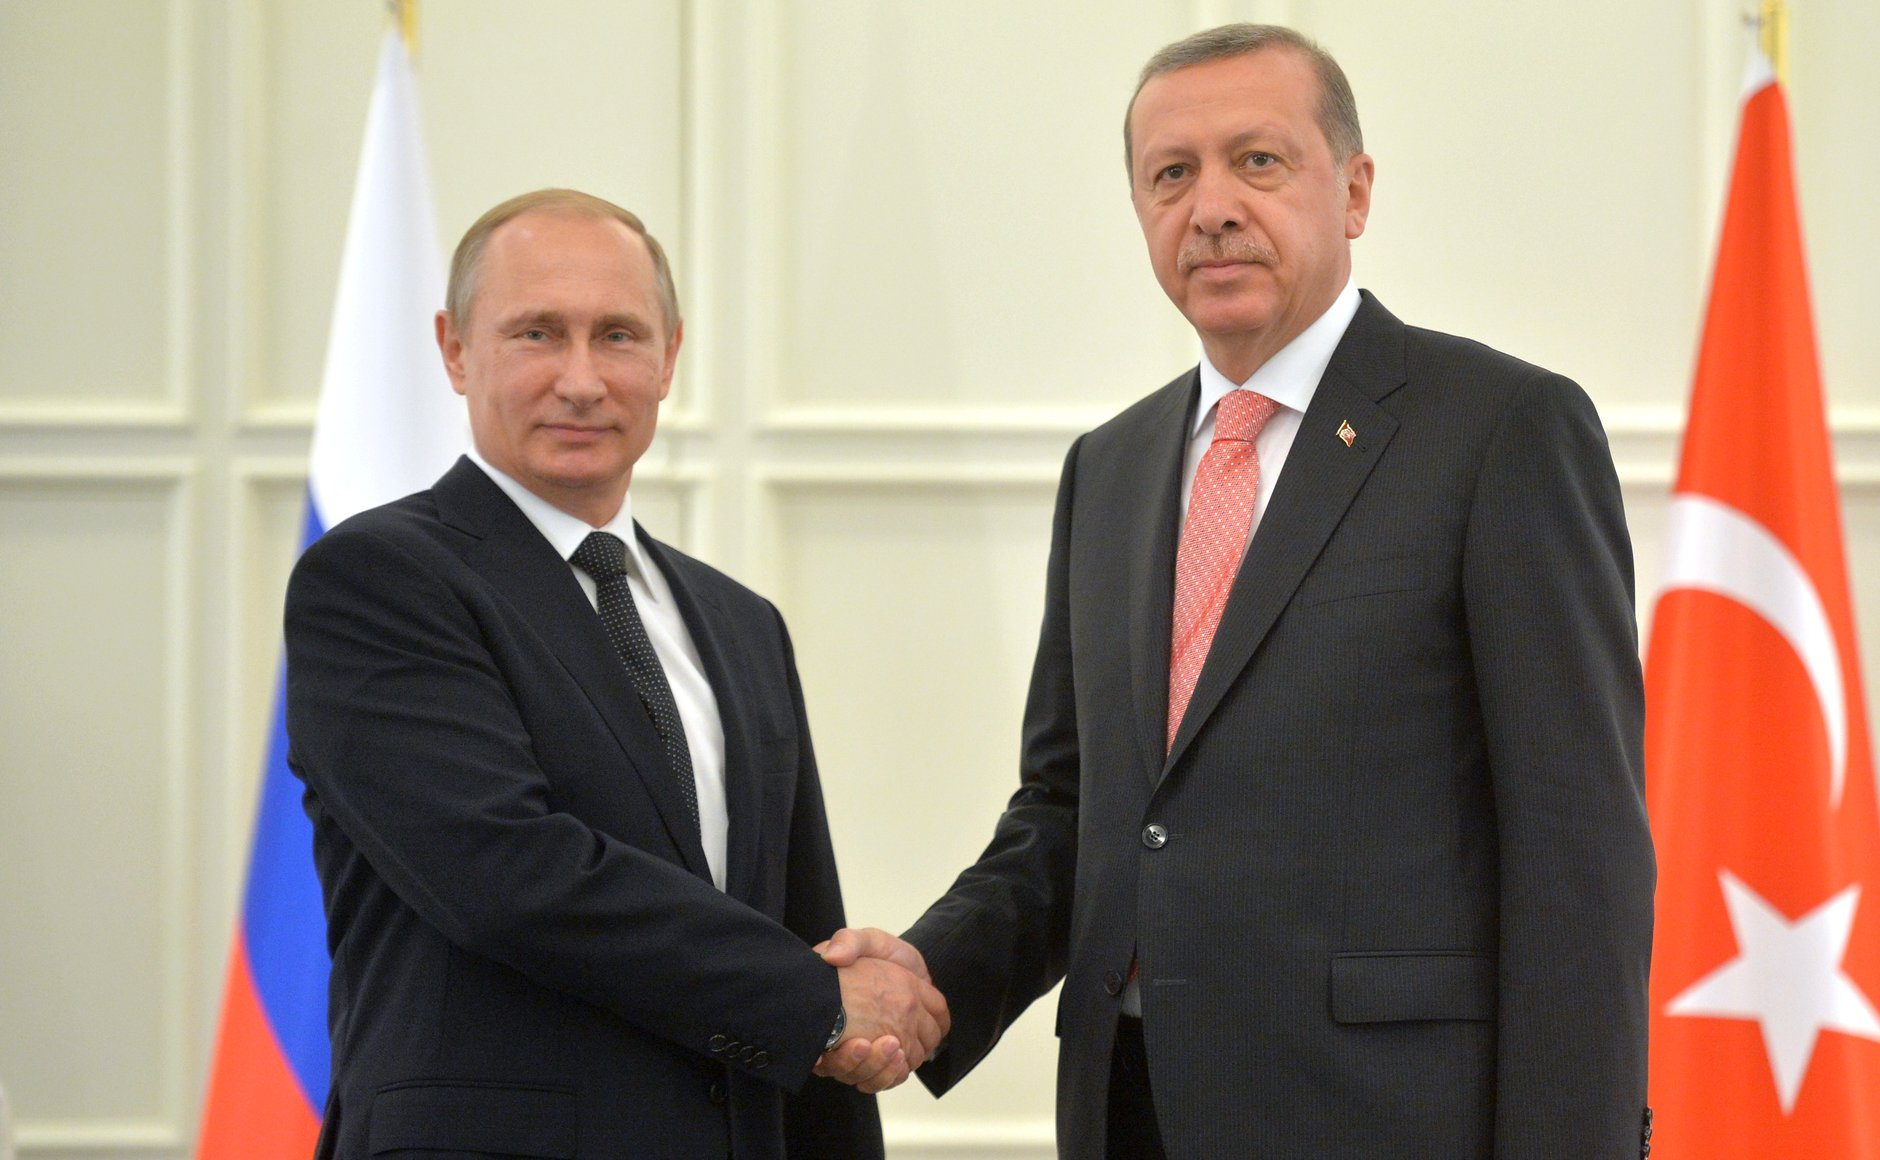 Putin spoke about Russia&#39